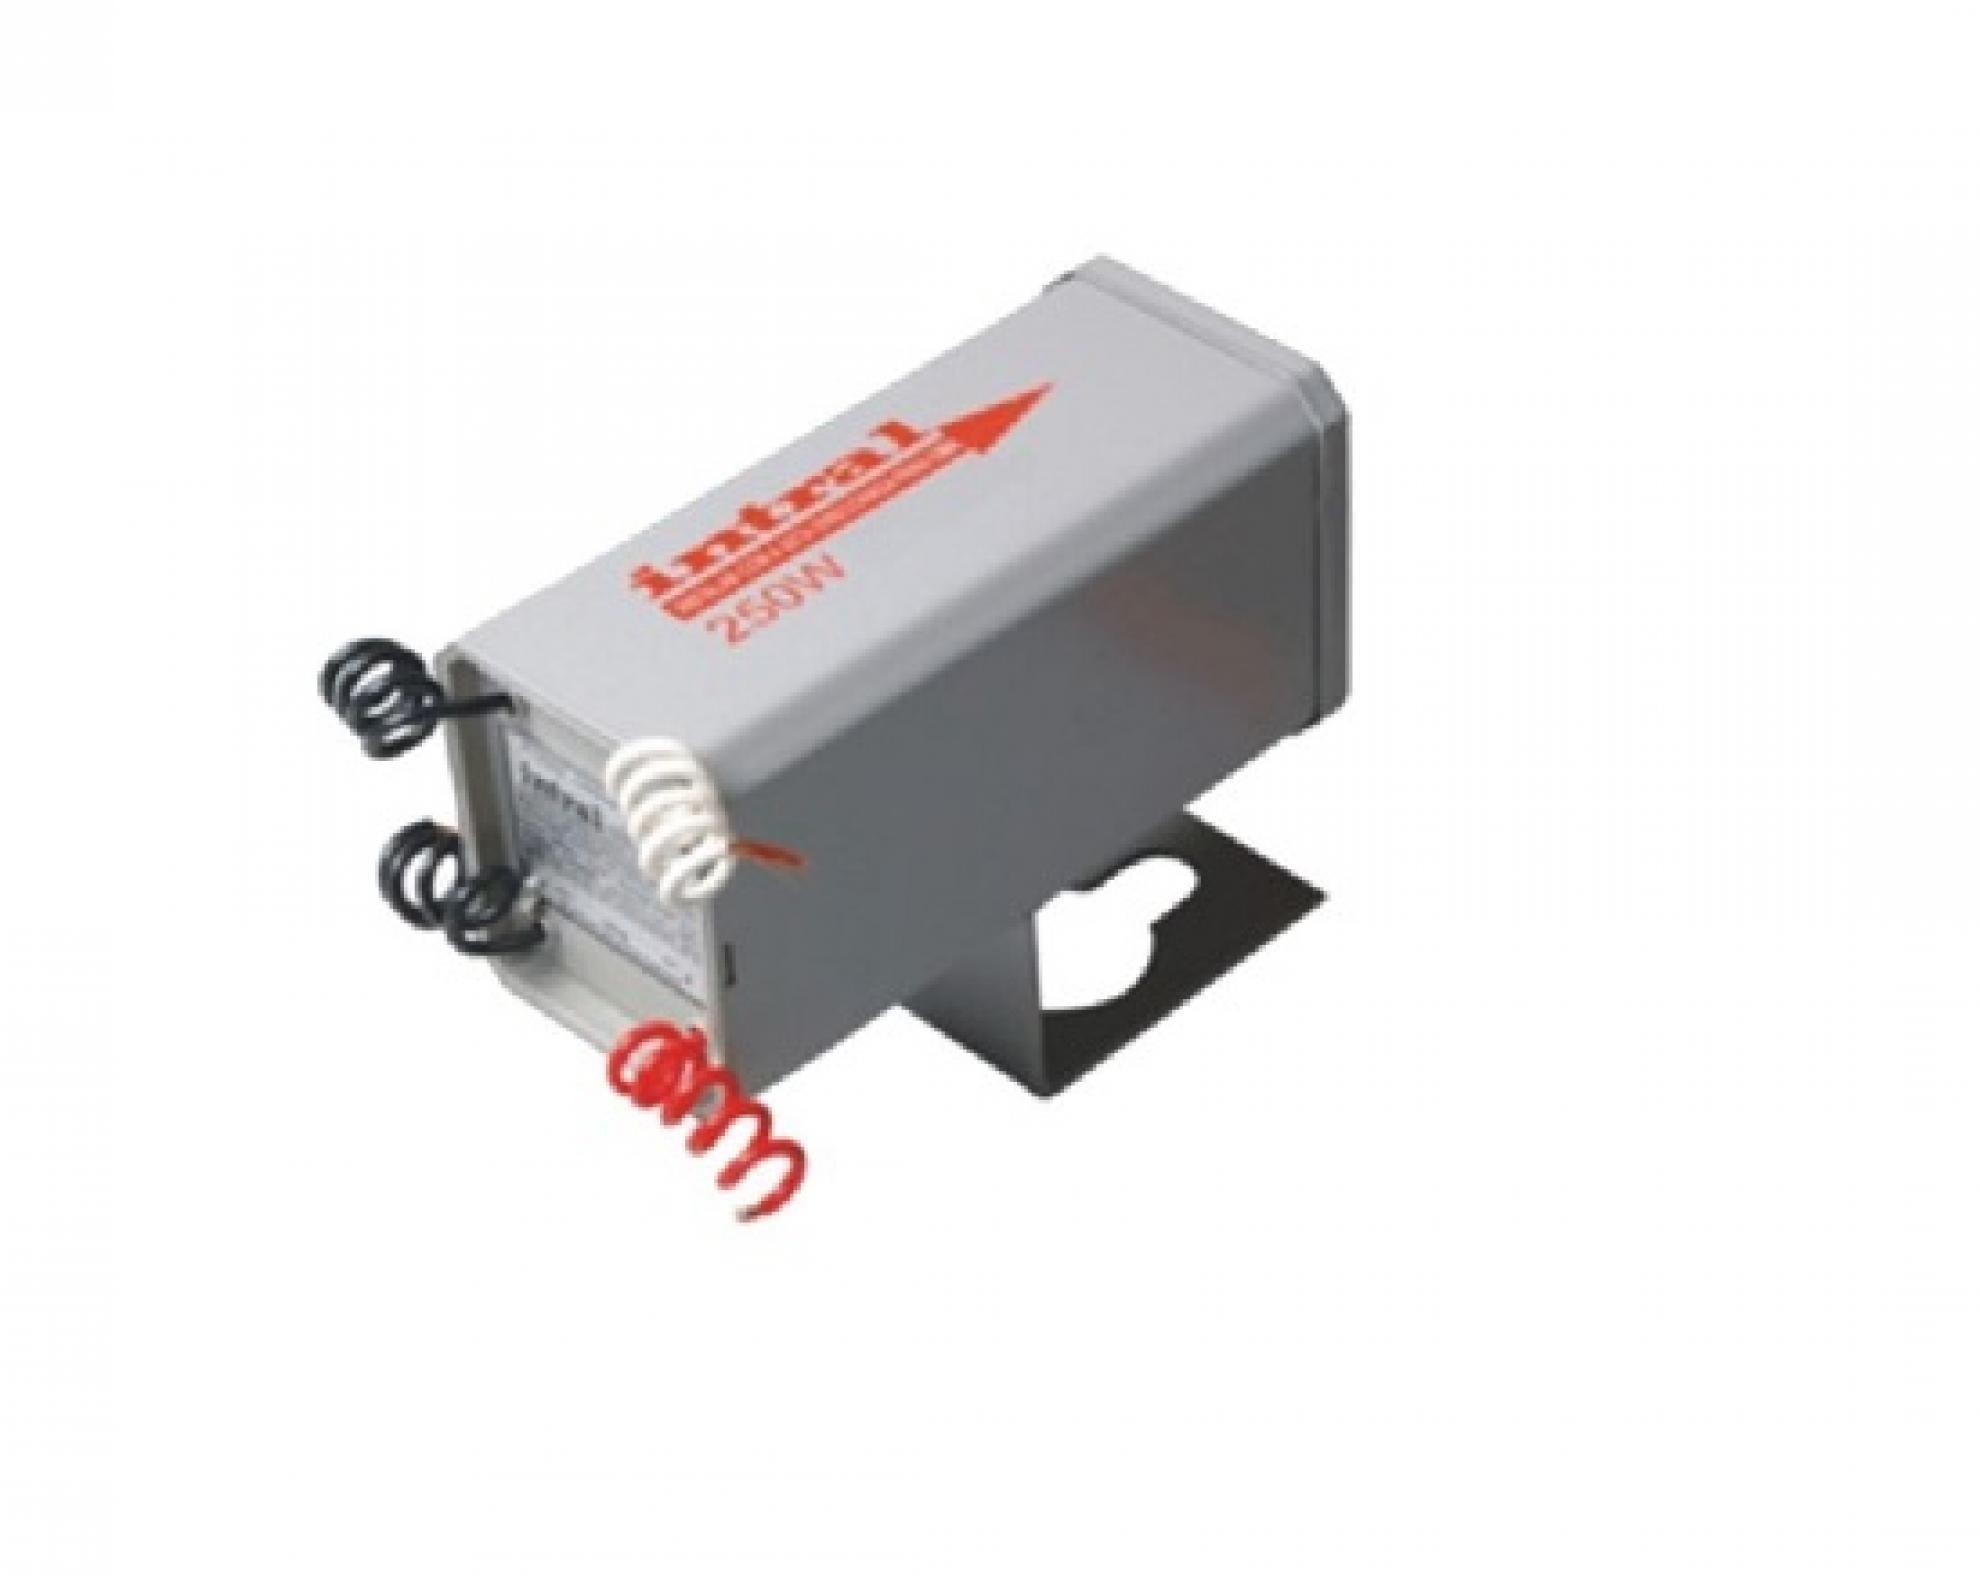 Reator vapor metalico sodio externo 250W